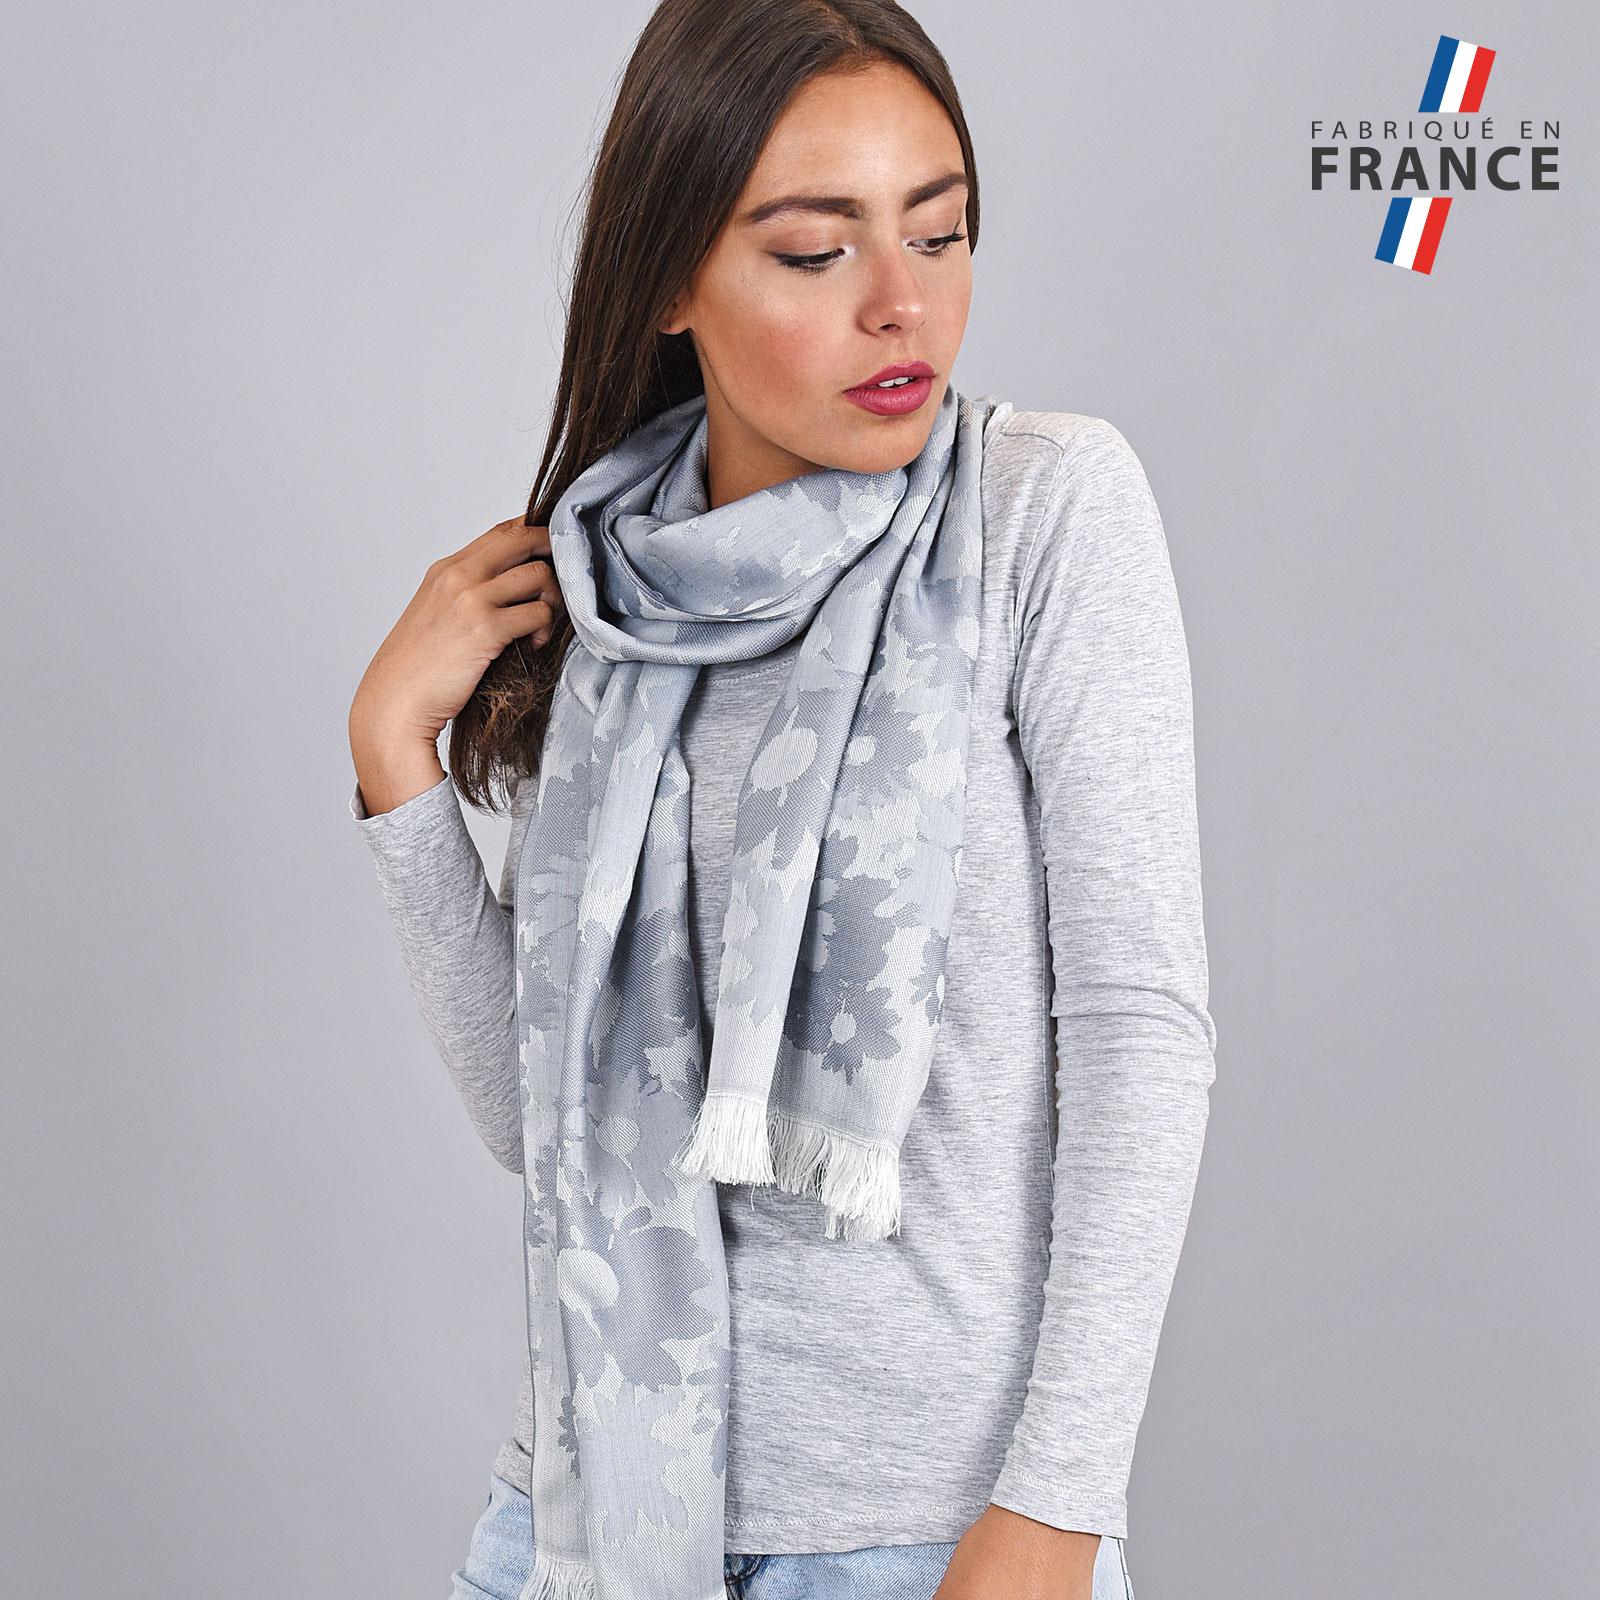 AT-04277-VF16-LB_FR-echarpe-legere-grise-argent-fleurs